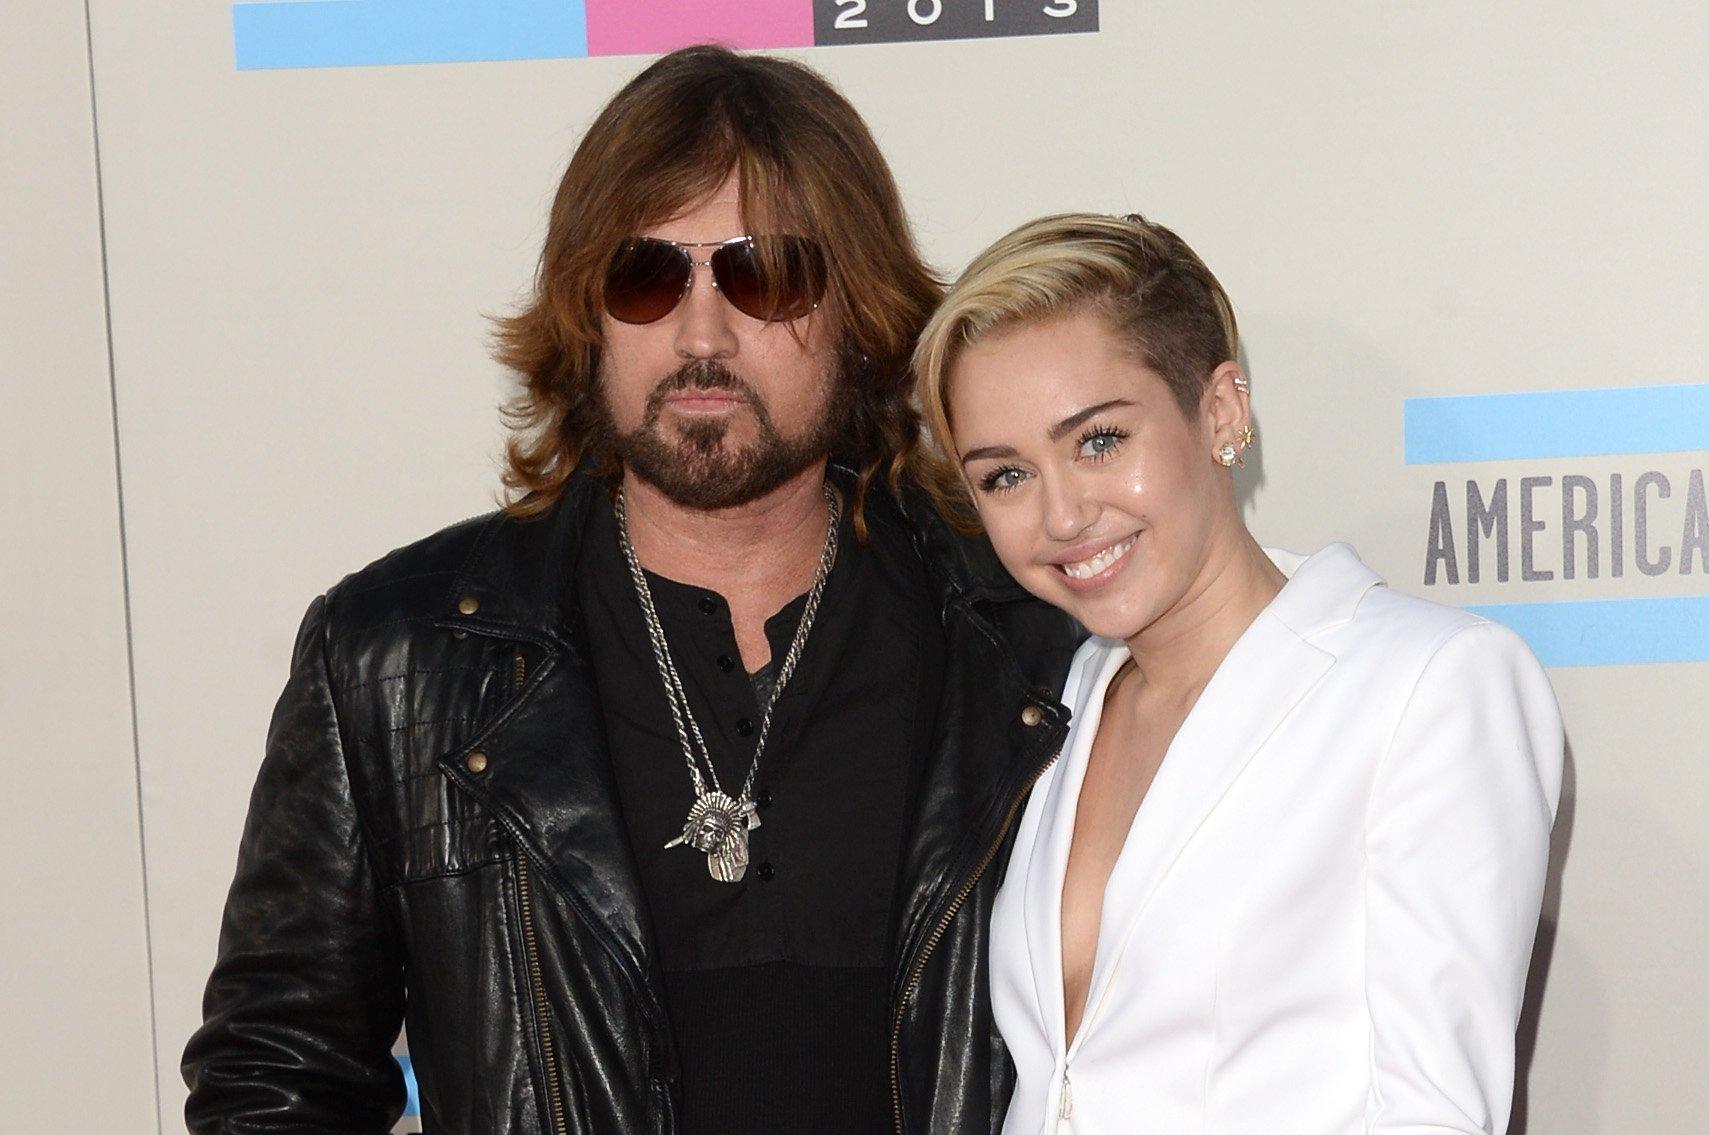 Miley Cyrusun babası Billy Ray Cyrus. Miley Cyrus 89